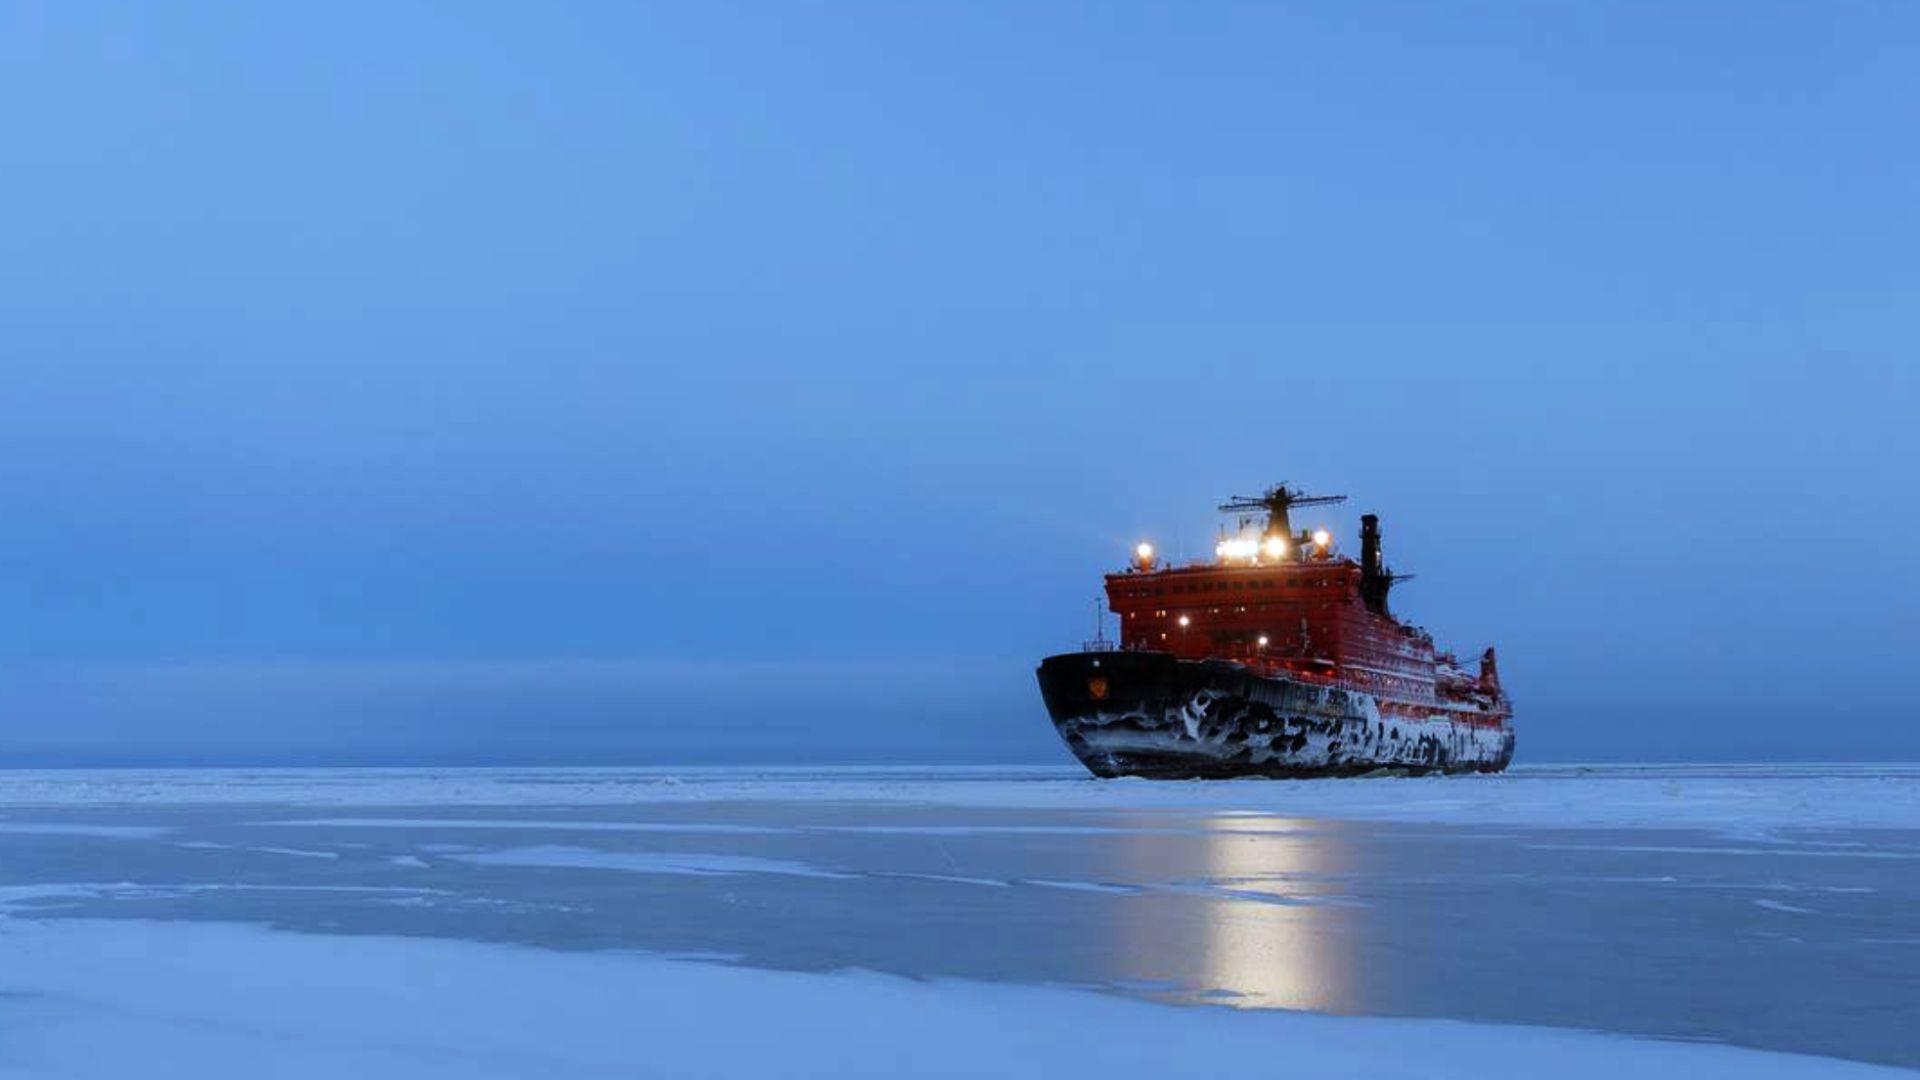 Project Arktika - Hydromat